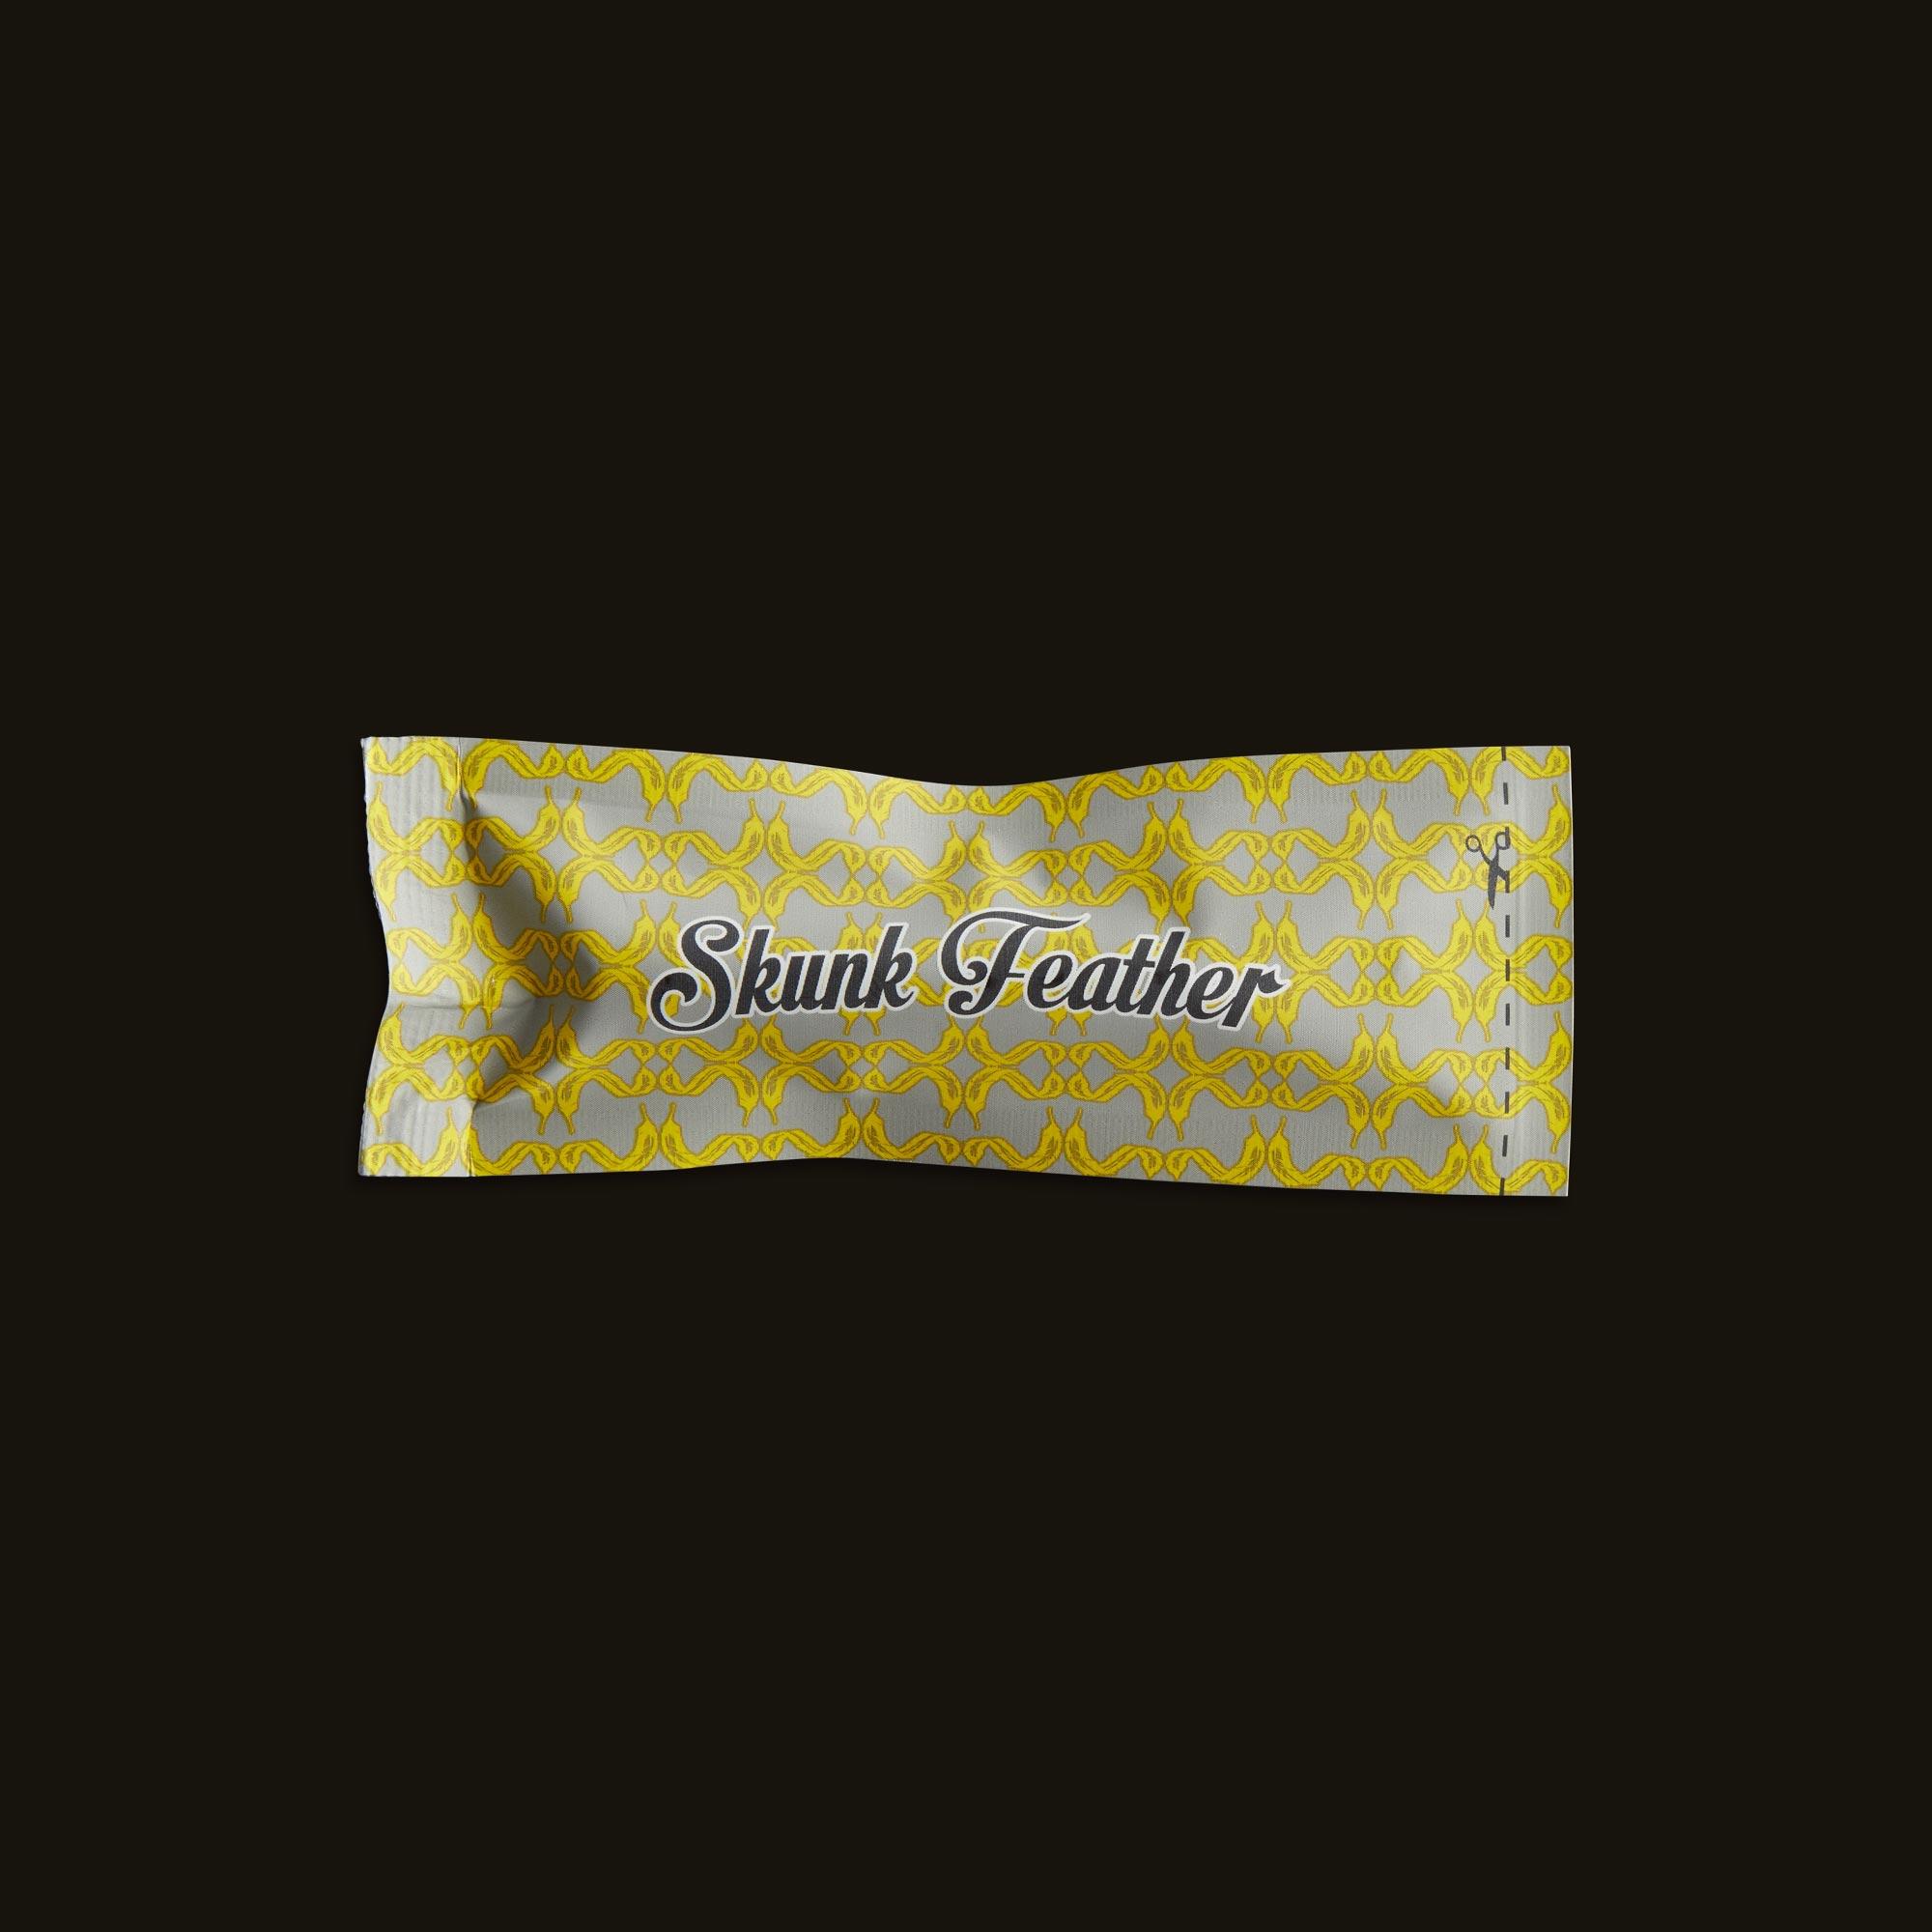 Skunk Feather Pleasure Point Cartridge Wrapper